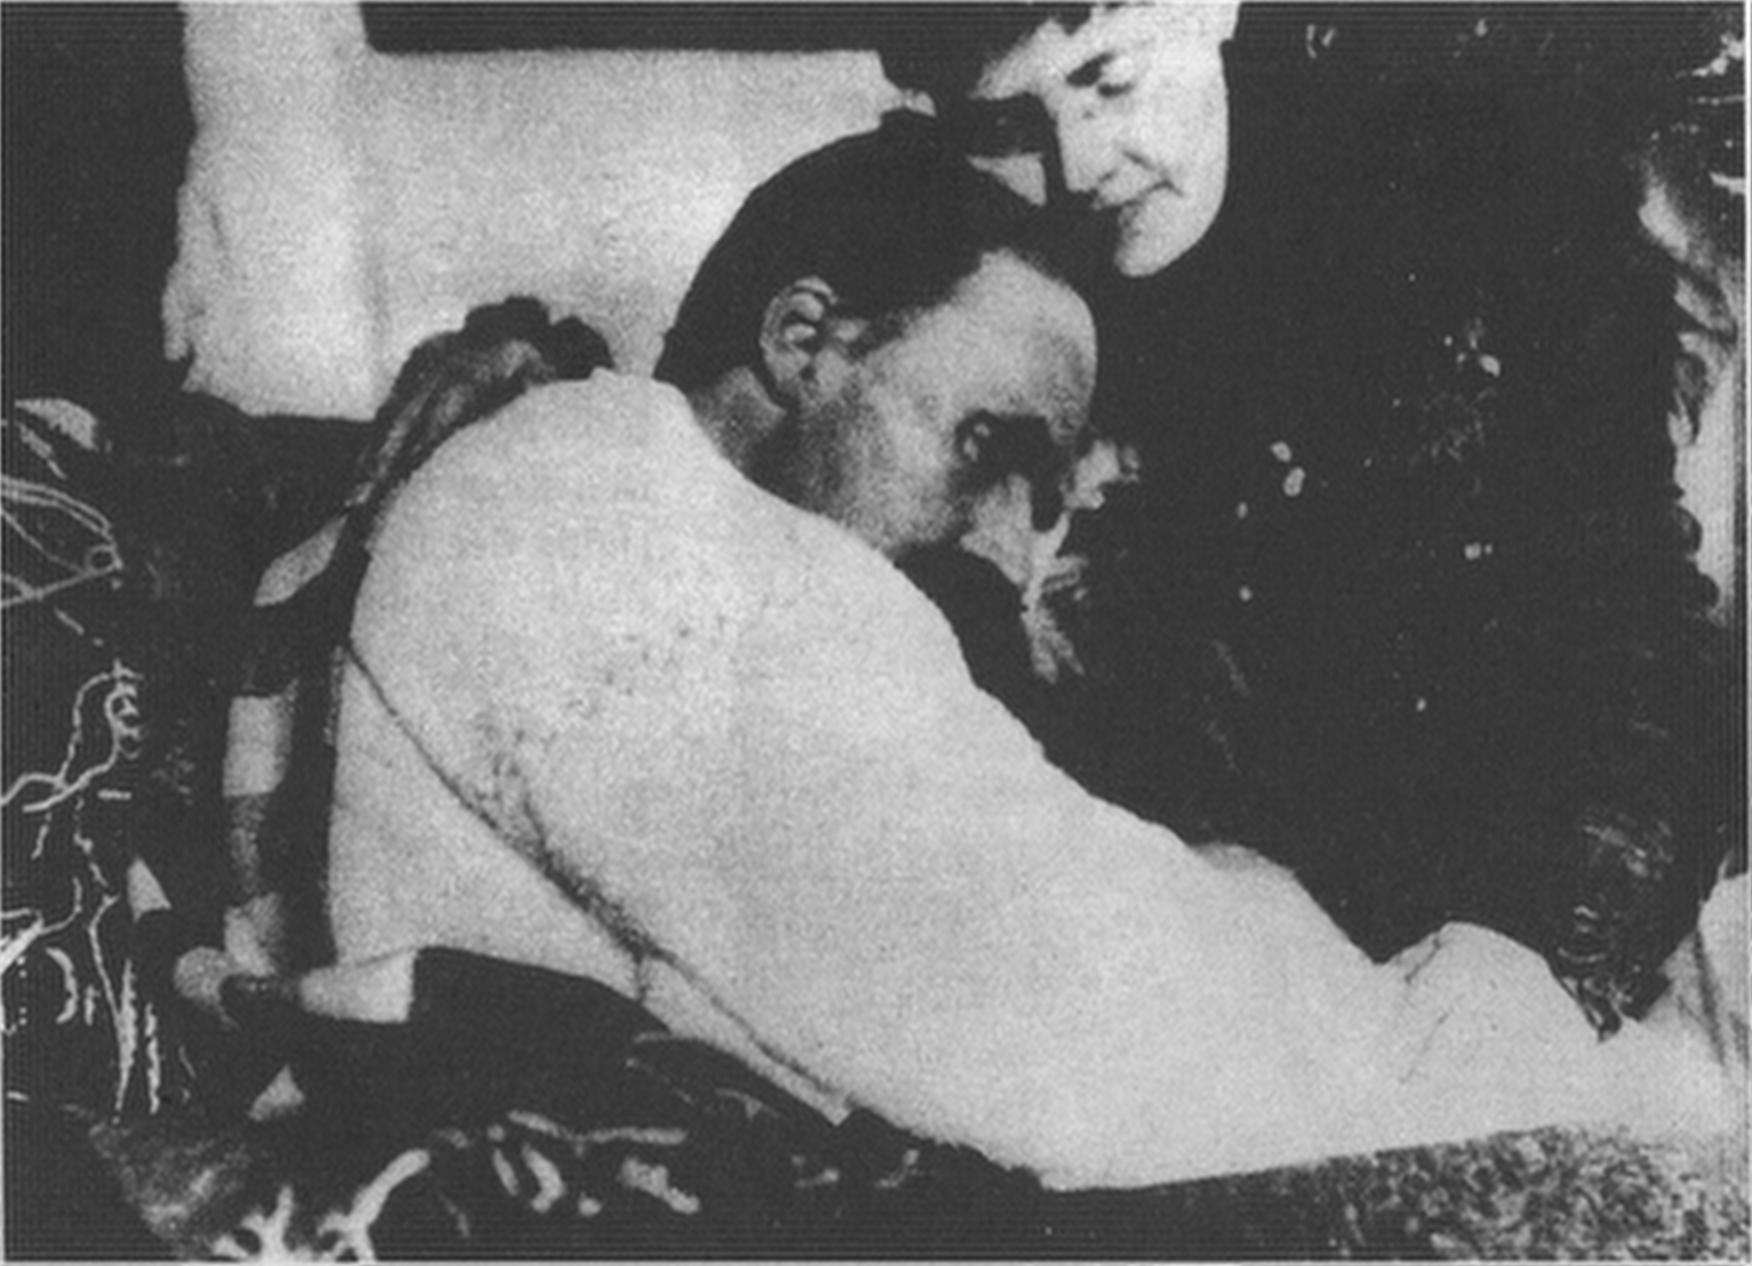 http://upload.wikimedia.org/wikipedia/commons/3/3b/Nietzsche_Olde_06.JPG